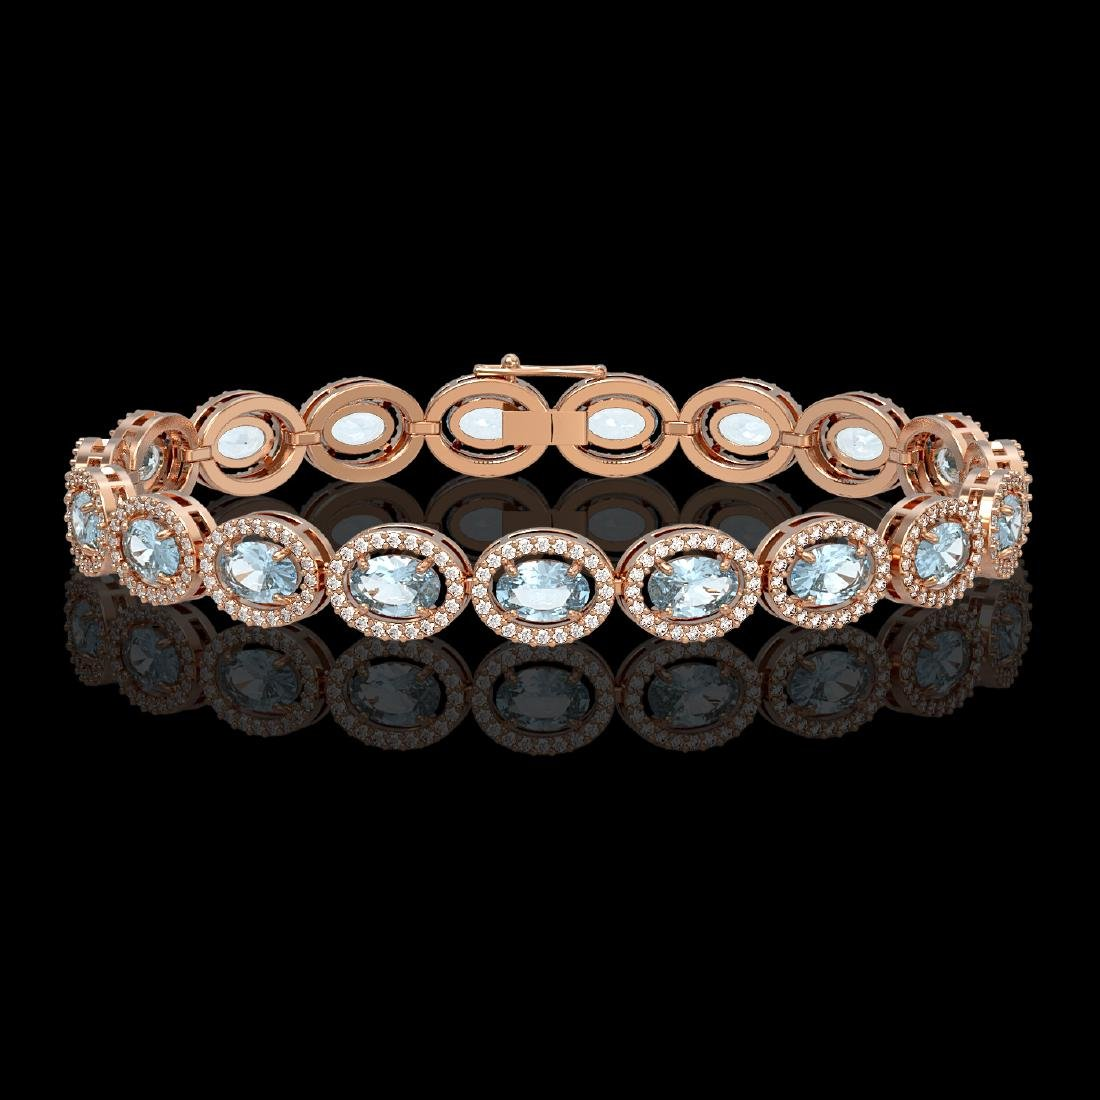 11.02 CTW Aquamarine & Diamond Halo Bracelet 10K Rose